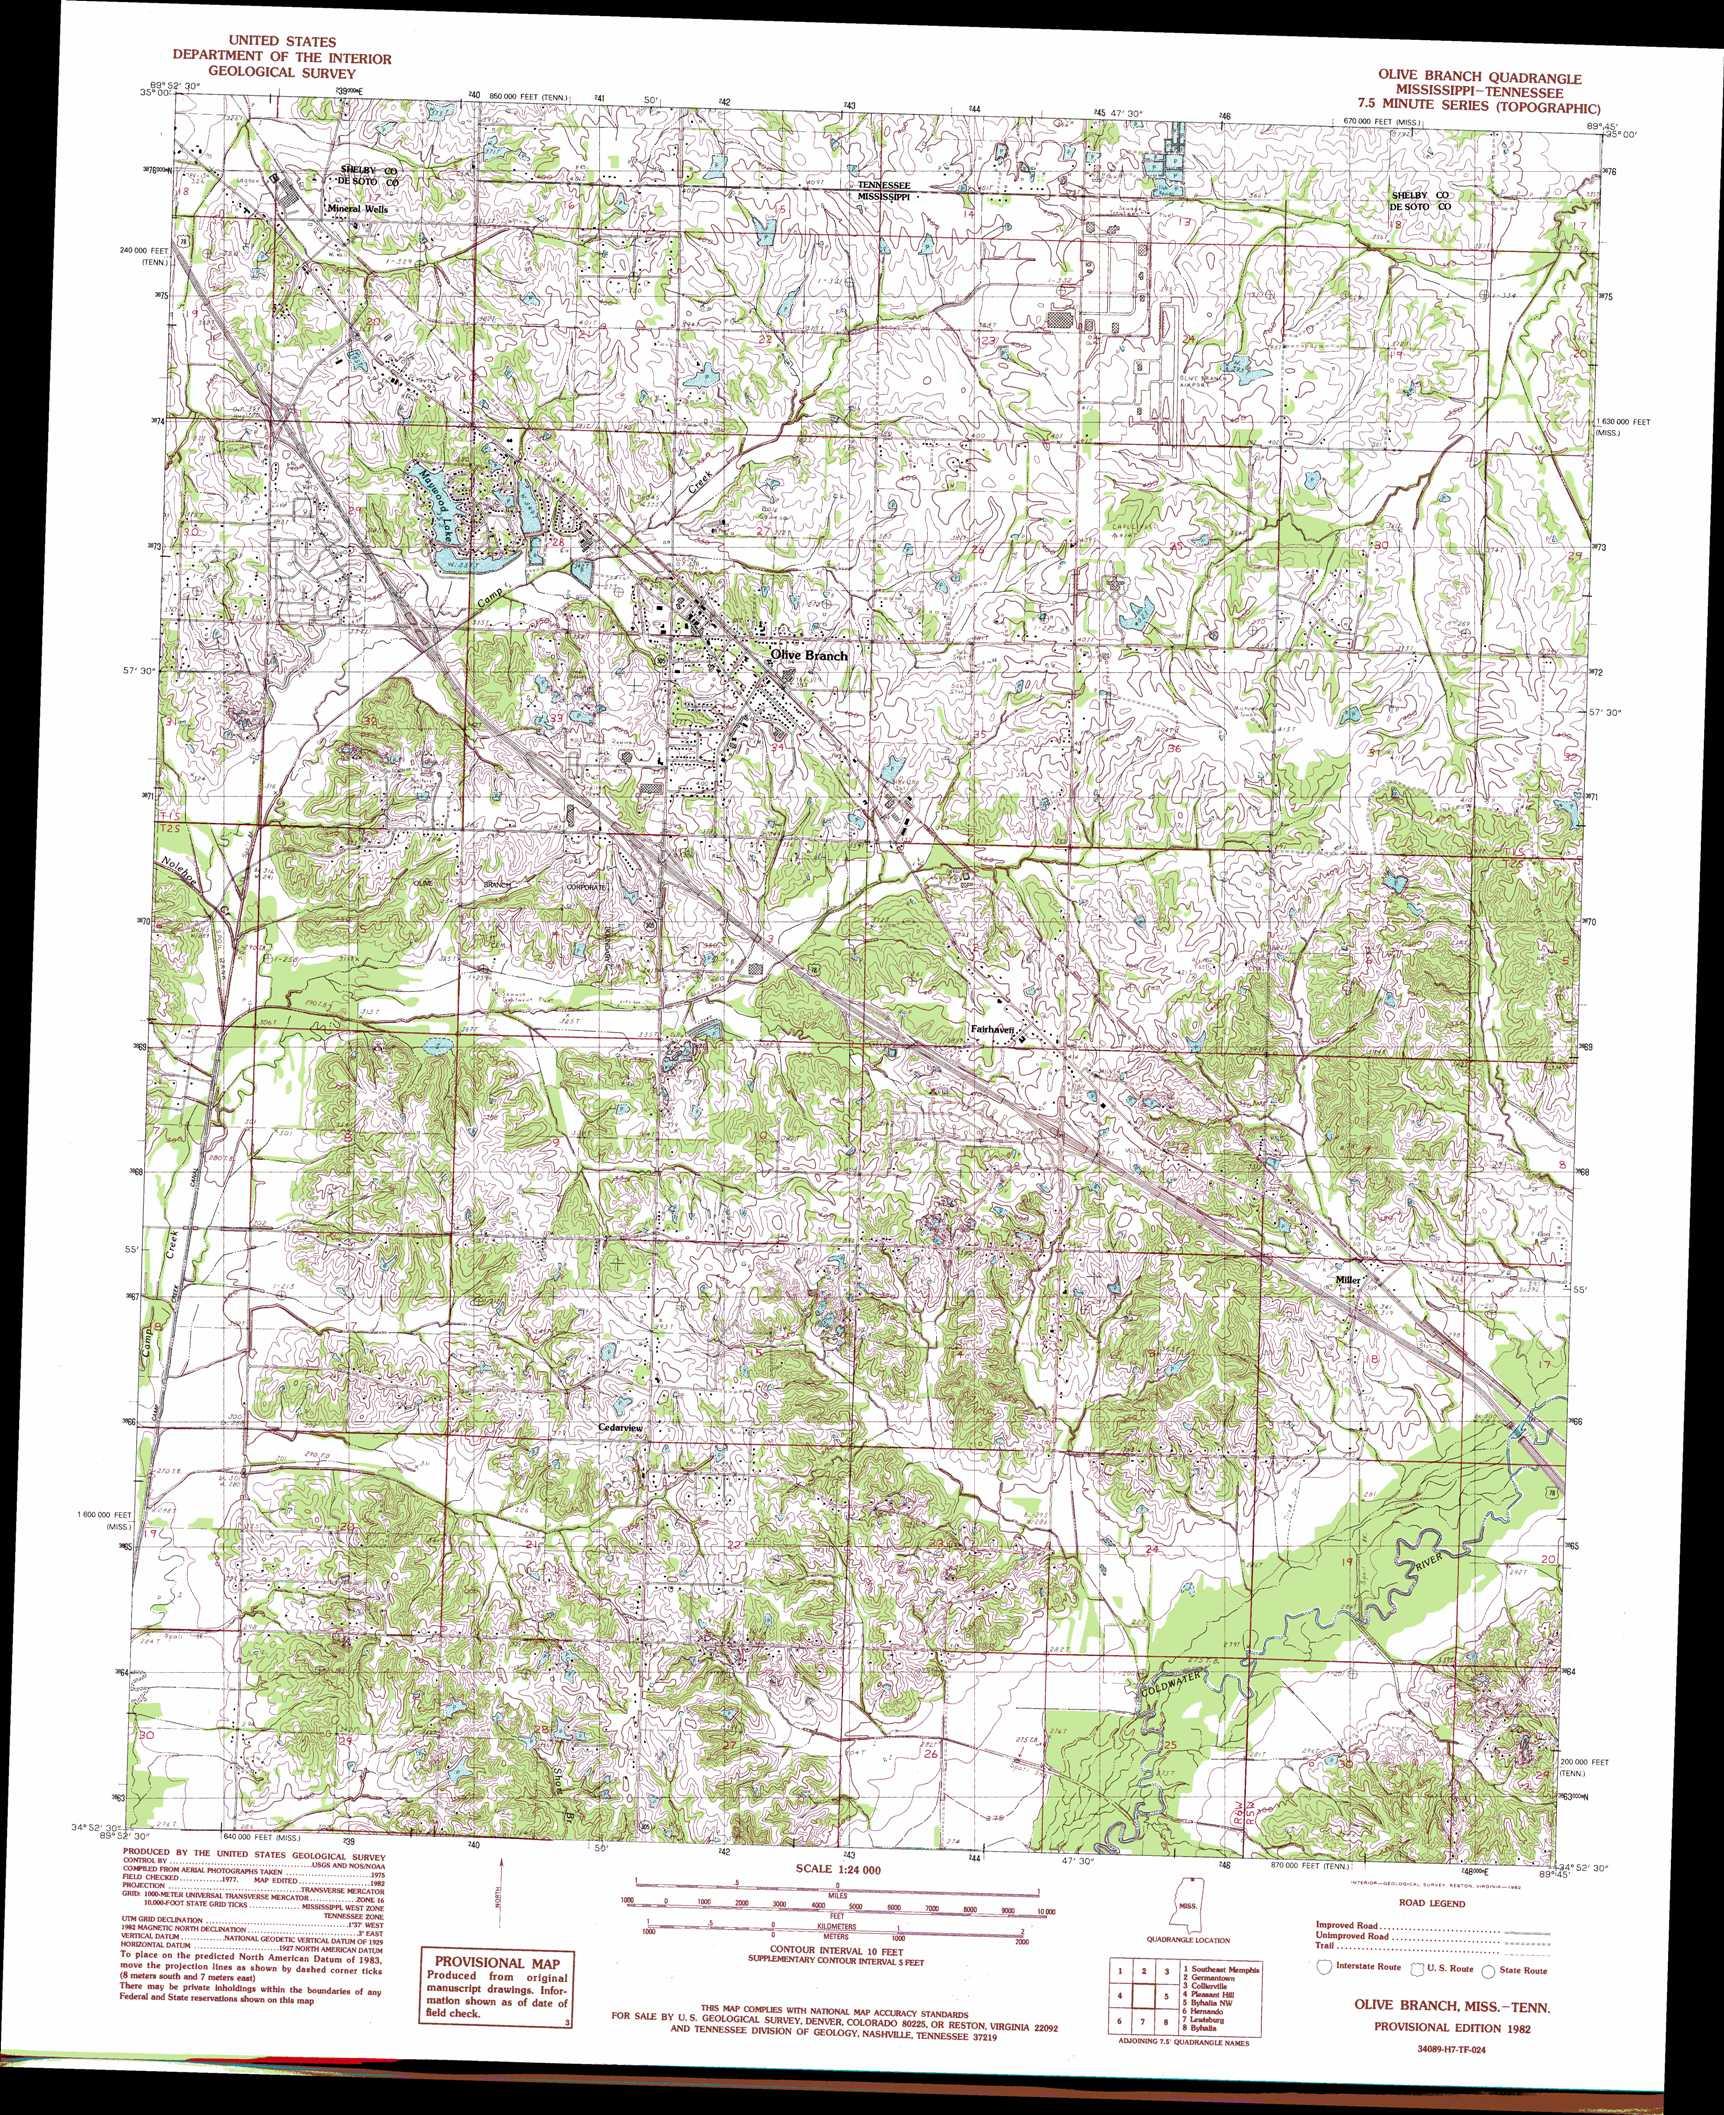 Olive Branch topographic map MS TN USGS Topo Quad 34089h7